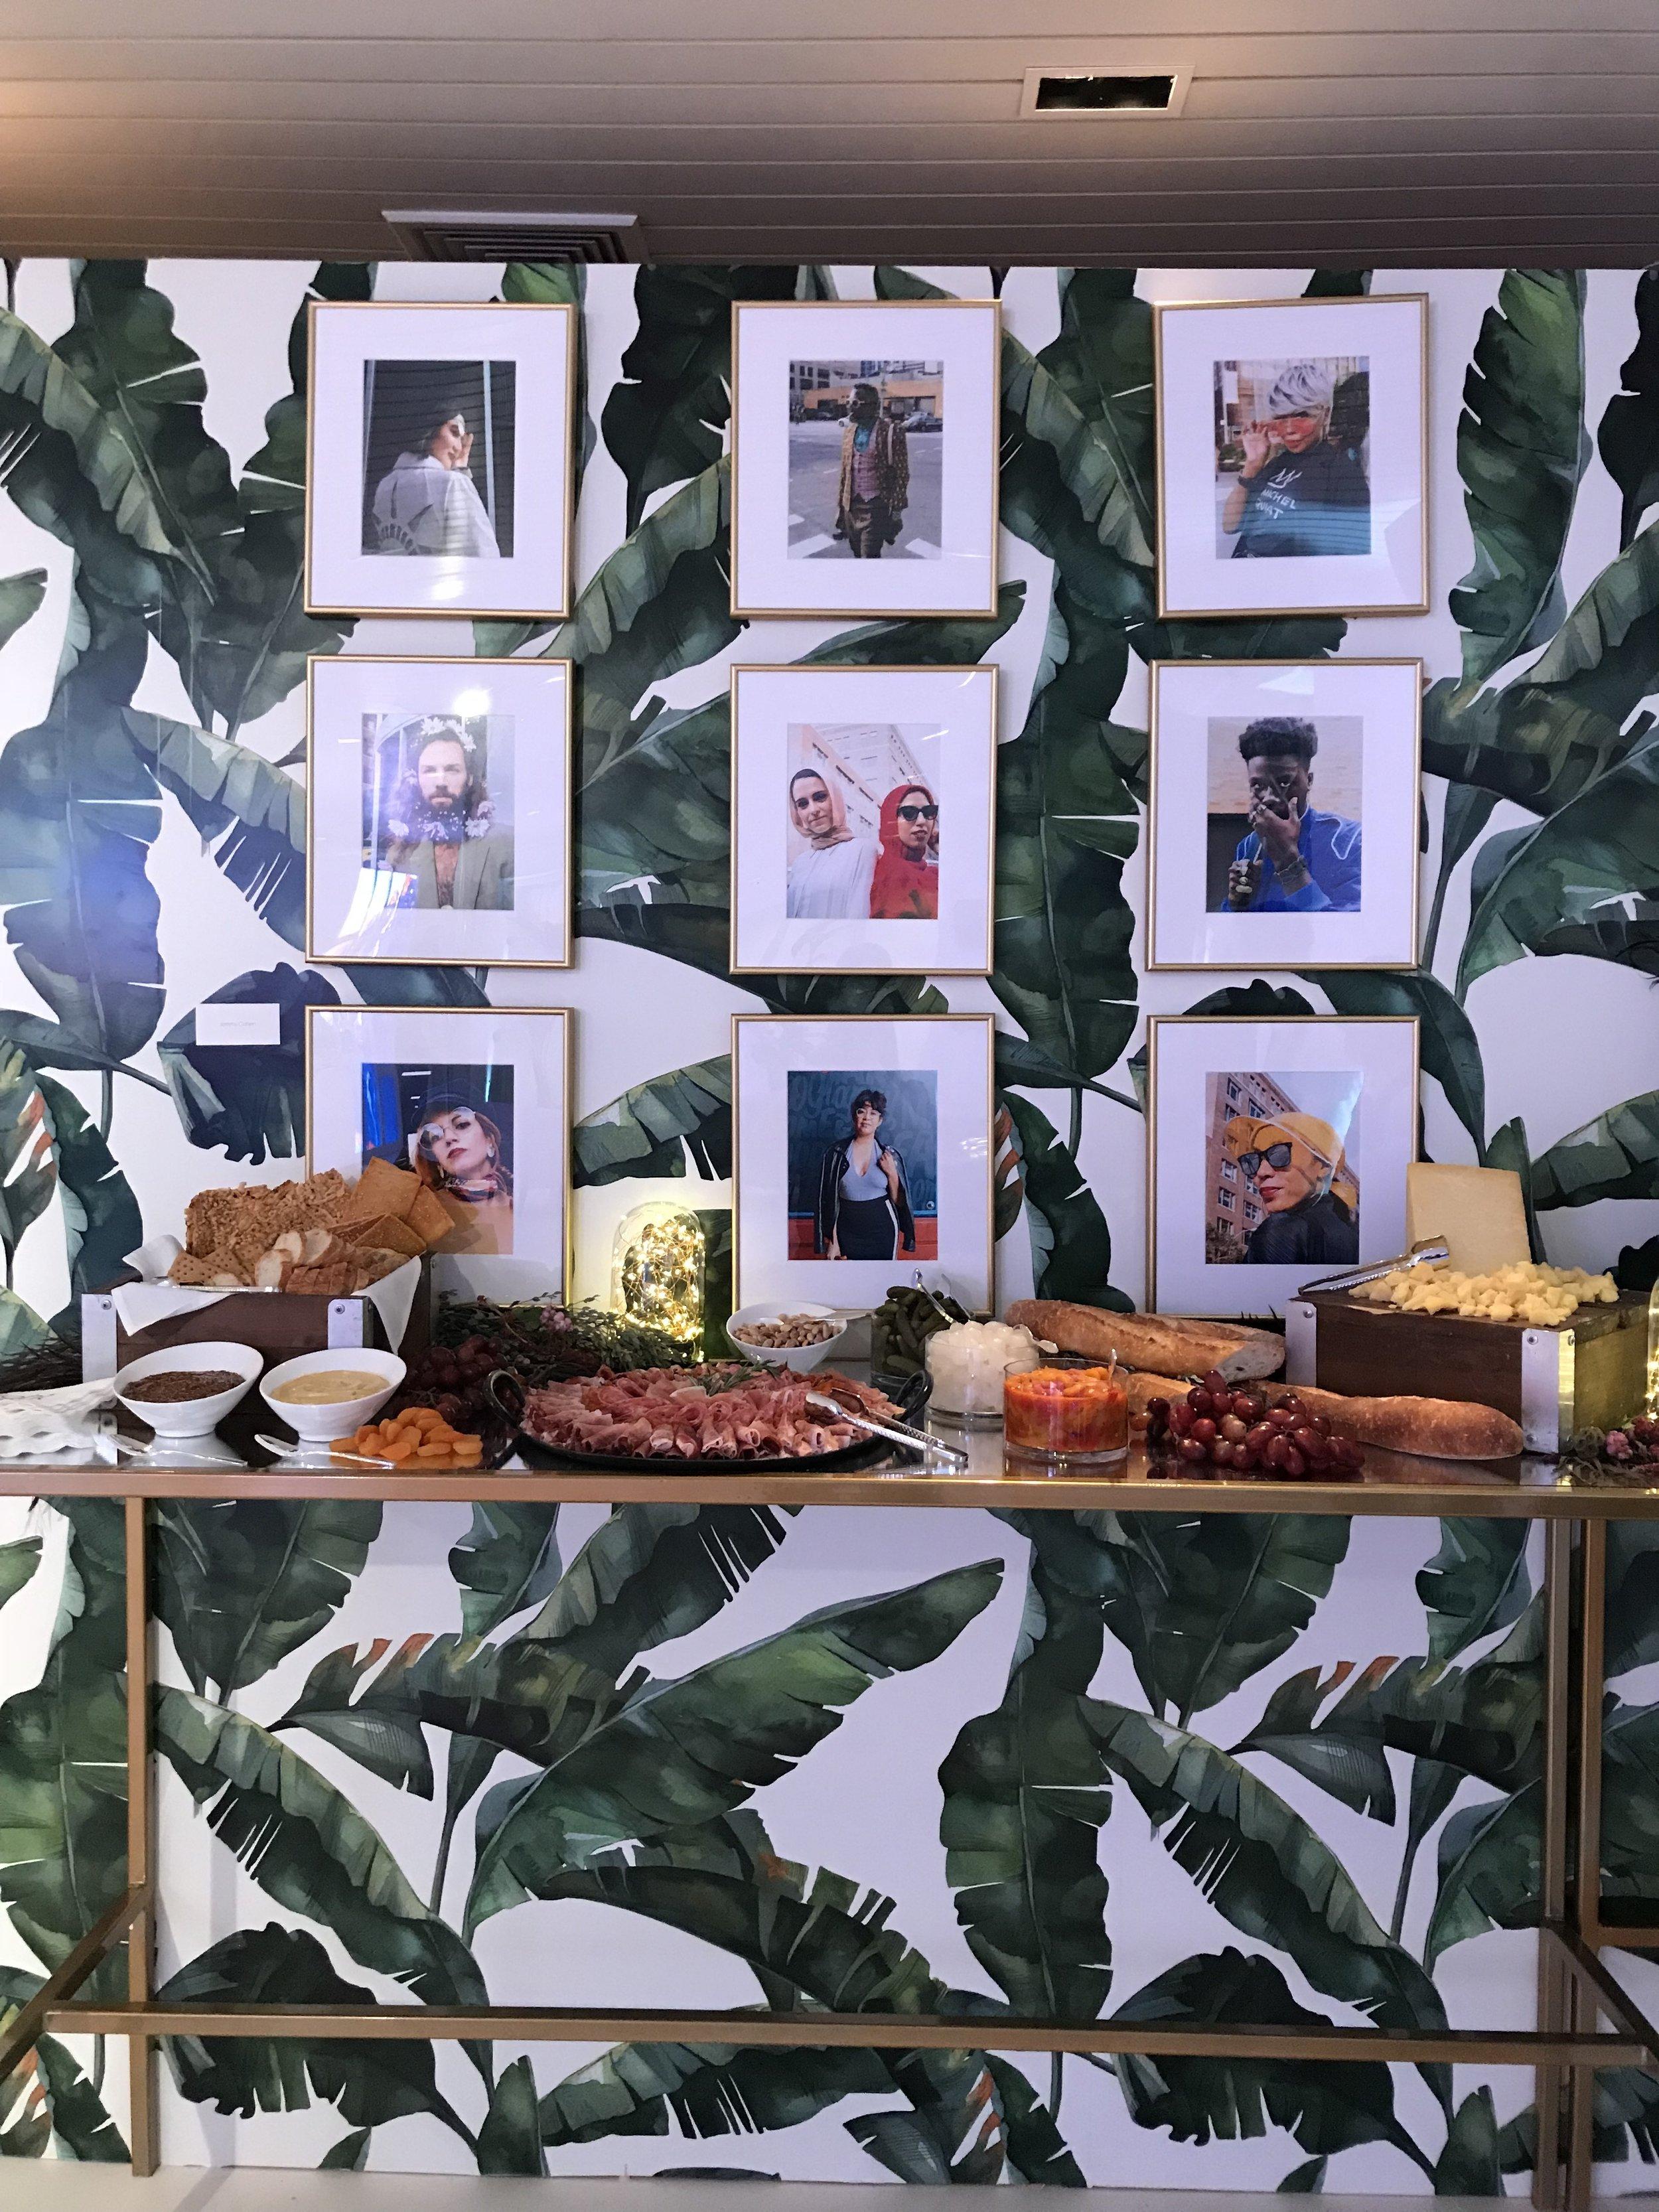 Light Portrait Wall_Food Exhibit.jpg